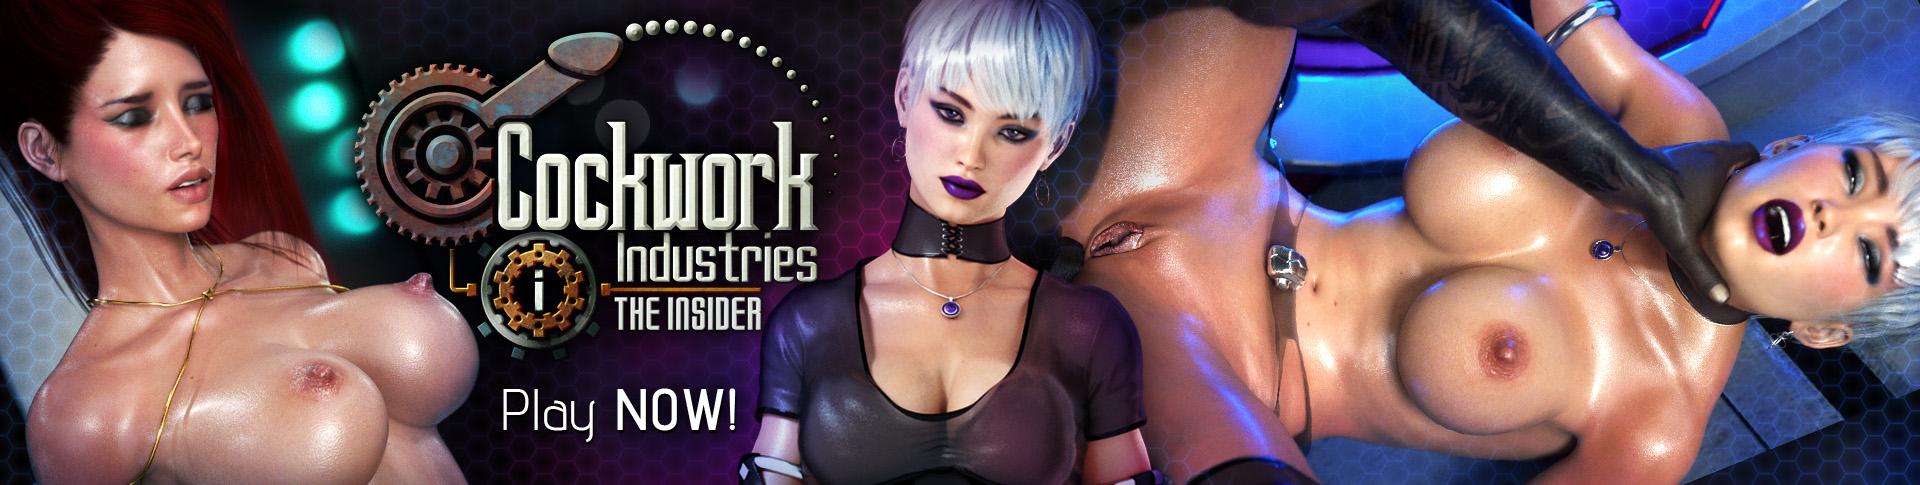 Cockwork Industries: Complete Edition [v4.16] [Digital Seductions]